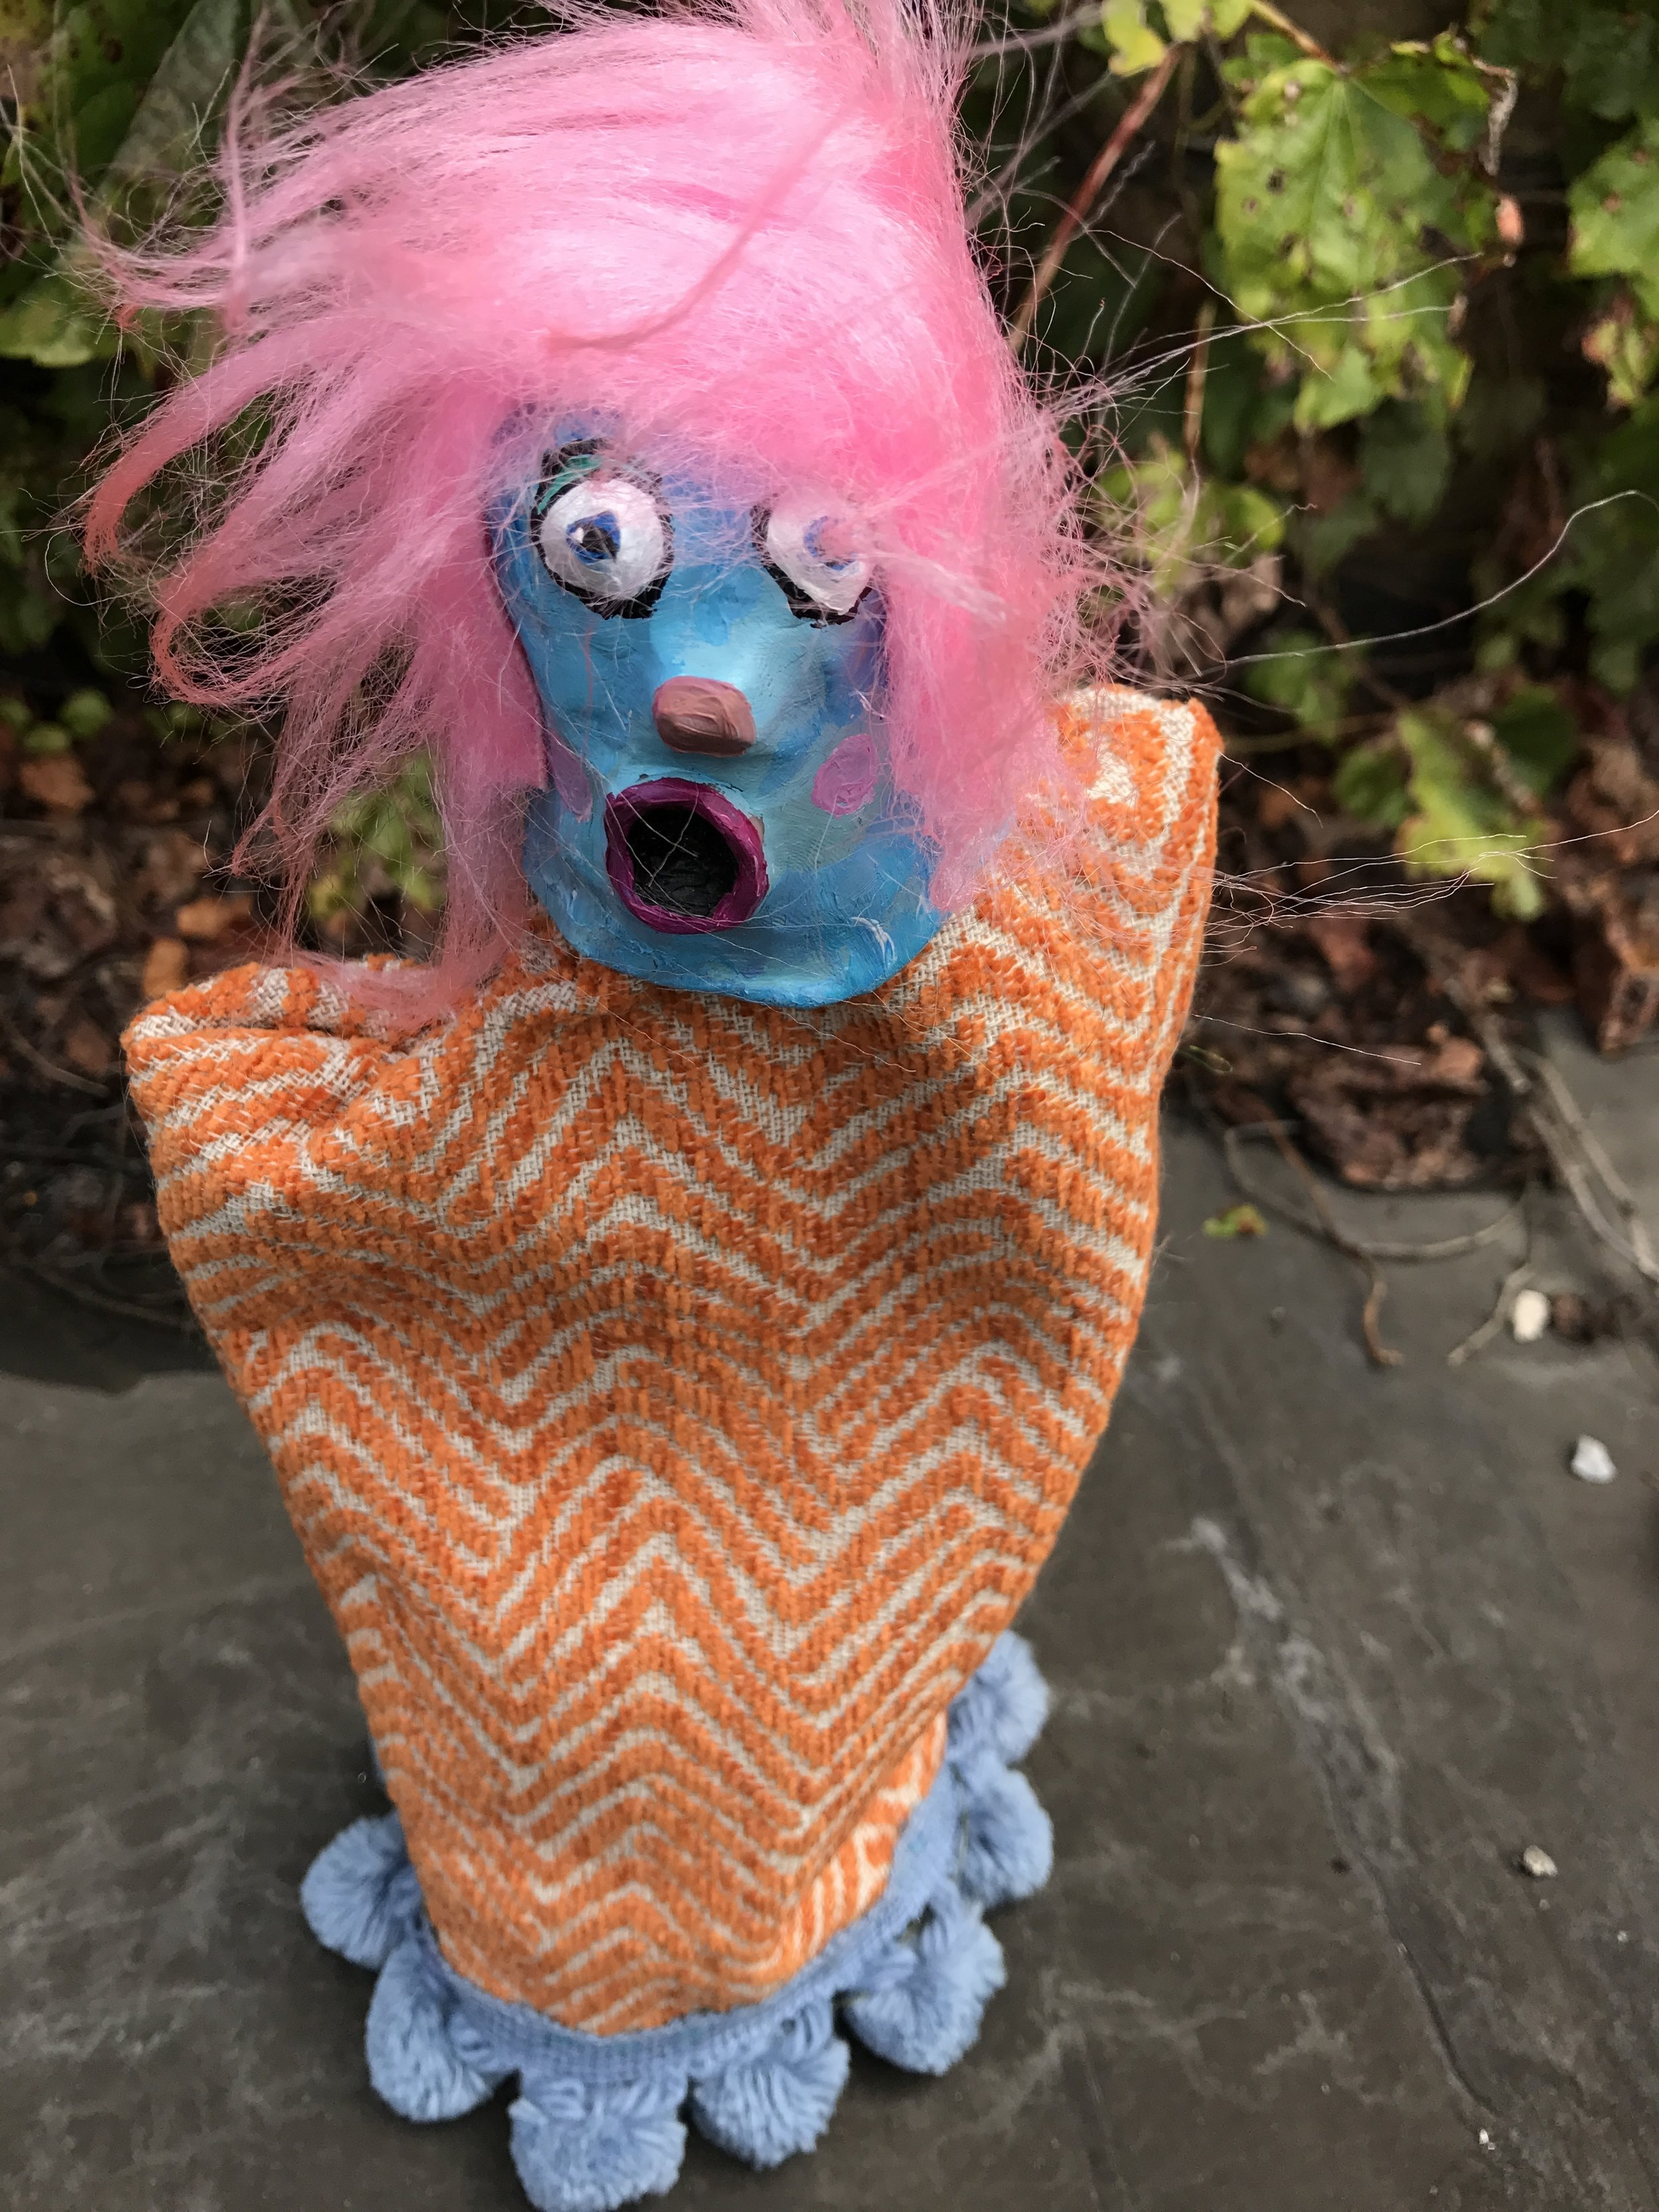 It's Faye, hand puppet